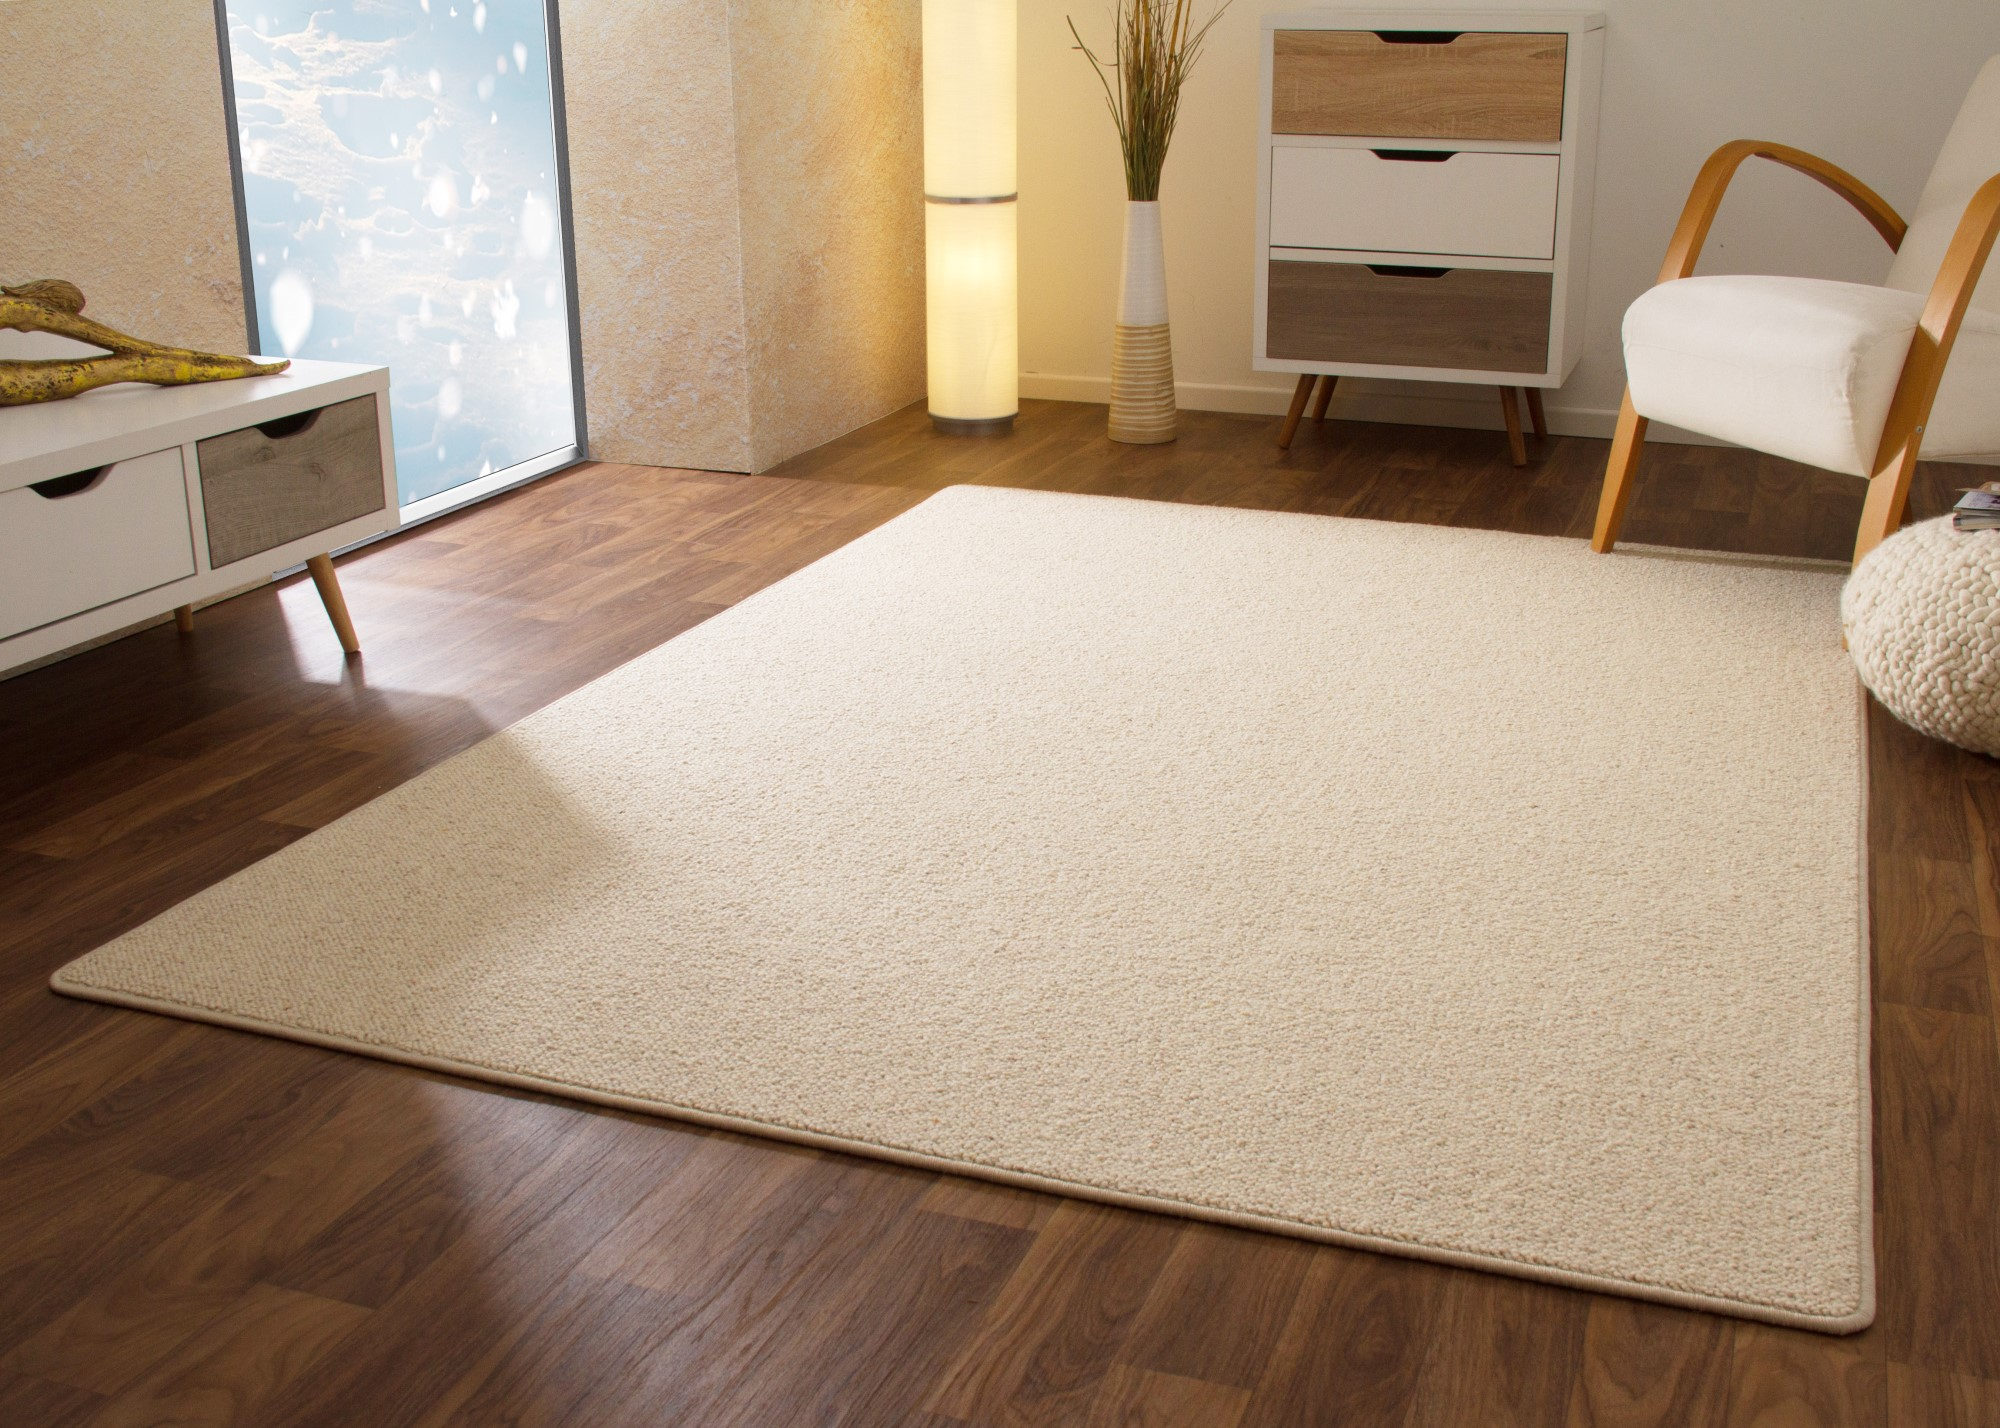 Designer Teppich Modern Berber Sydney Grau Creme Weiß 100% Wolle   eBay